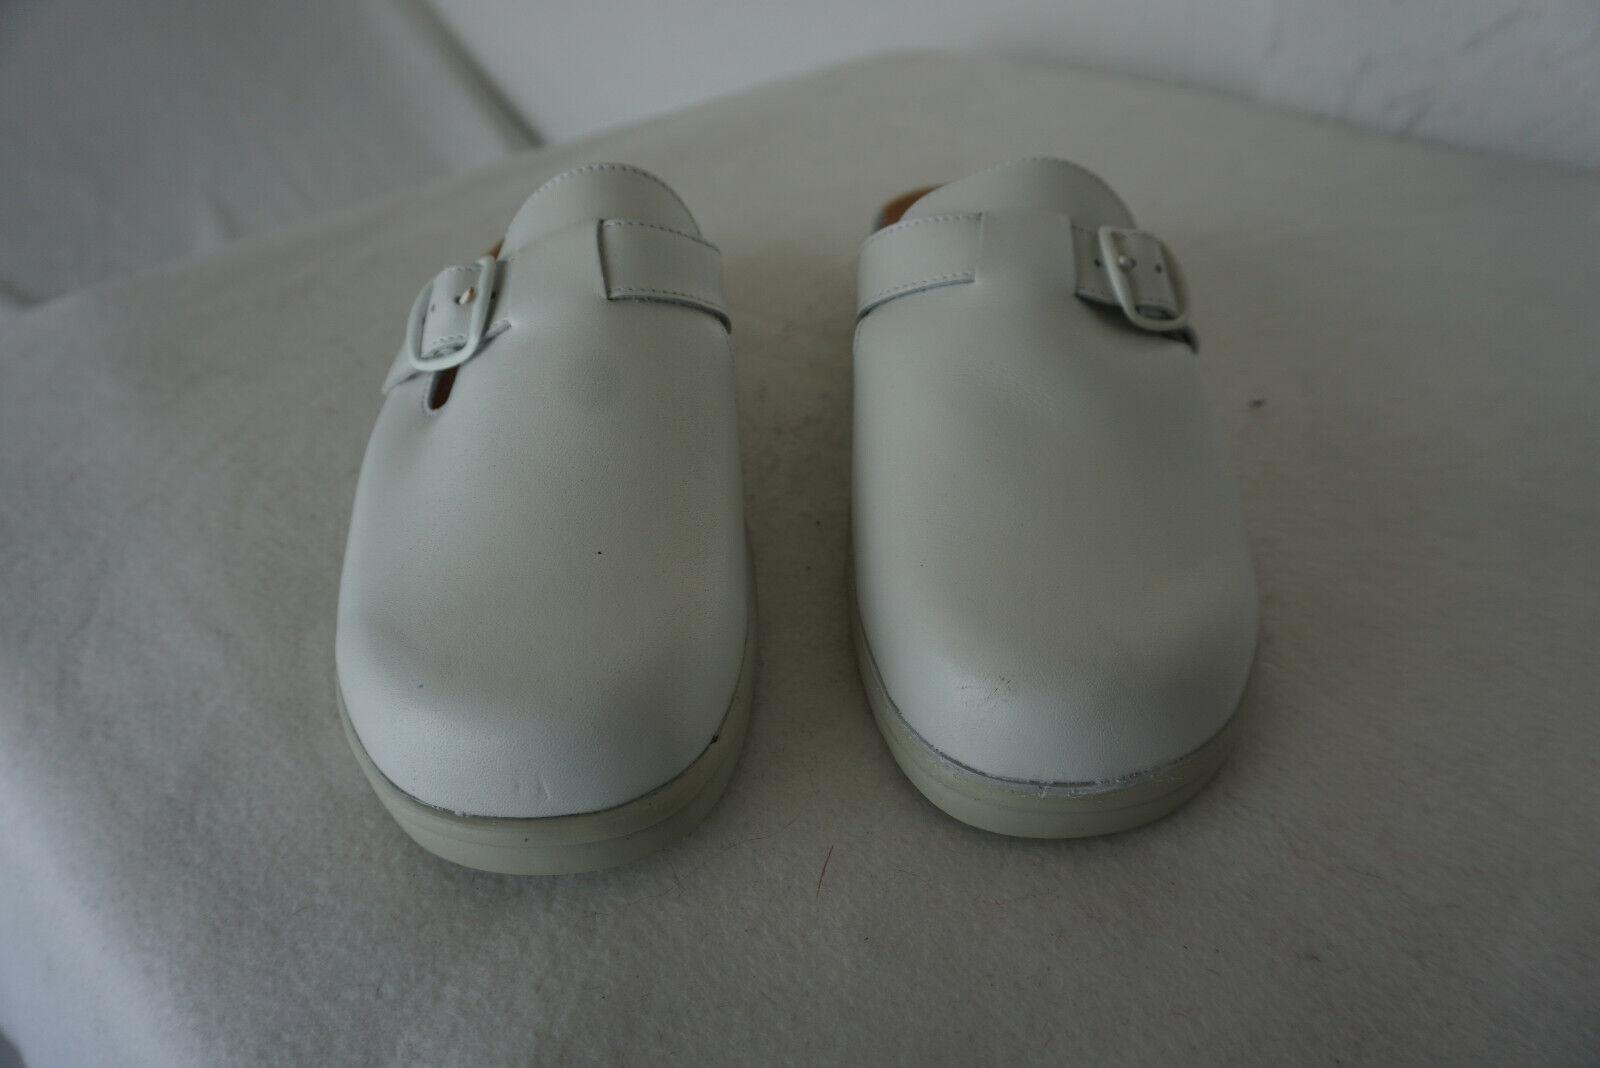 Ortopedic Hartjes Hartjes Hartjes kvinnor Sandals Practice skor Clogs Storlek 40 vit läder ny  topp varumärke